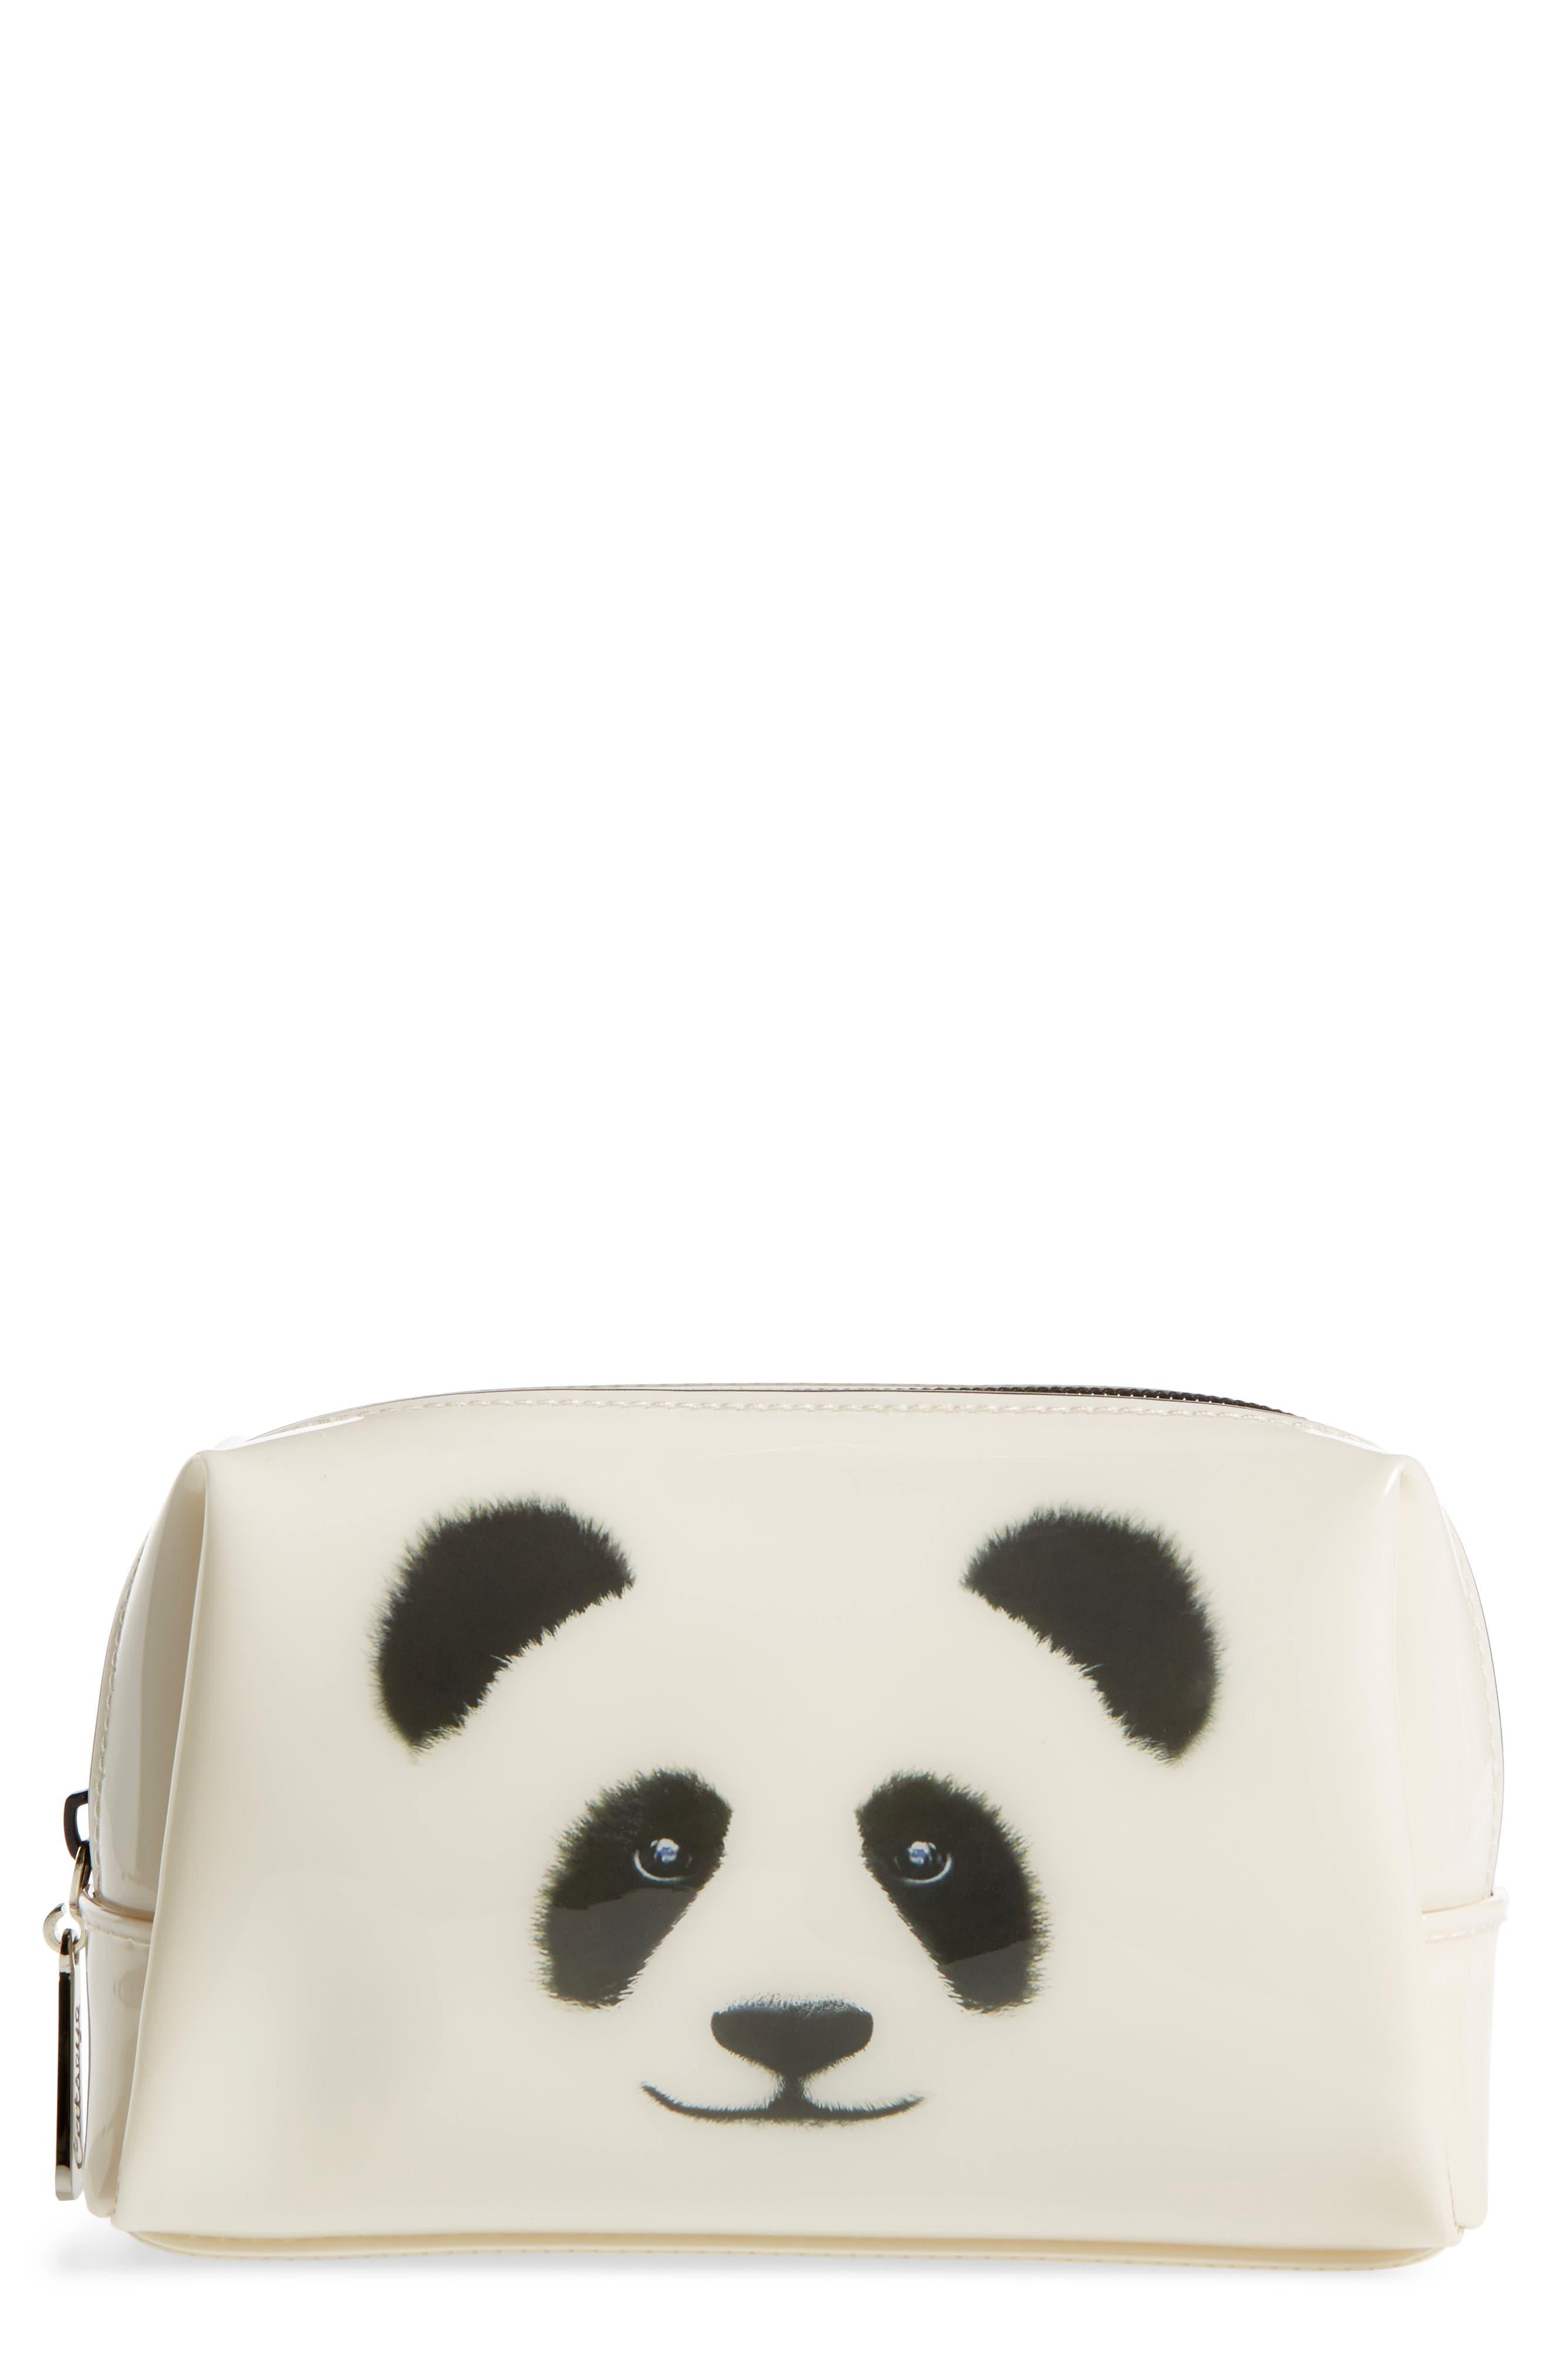 Monochrome Panda Cosmetics Bag,                         Main,                         color, 101